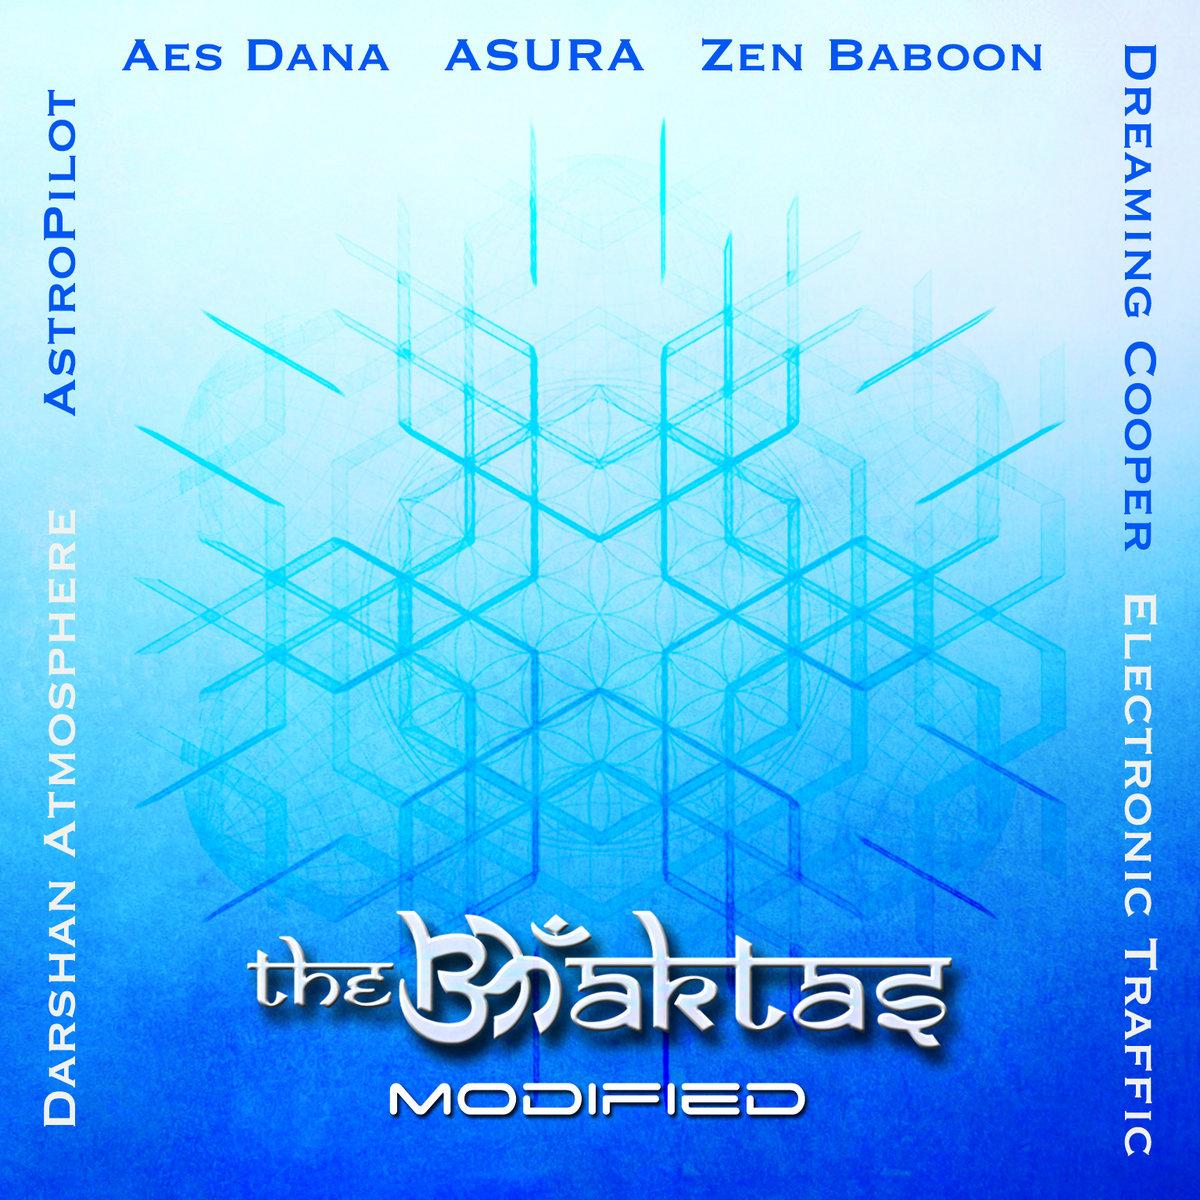 MODIFIED | The Bhaktas